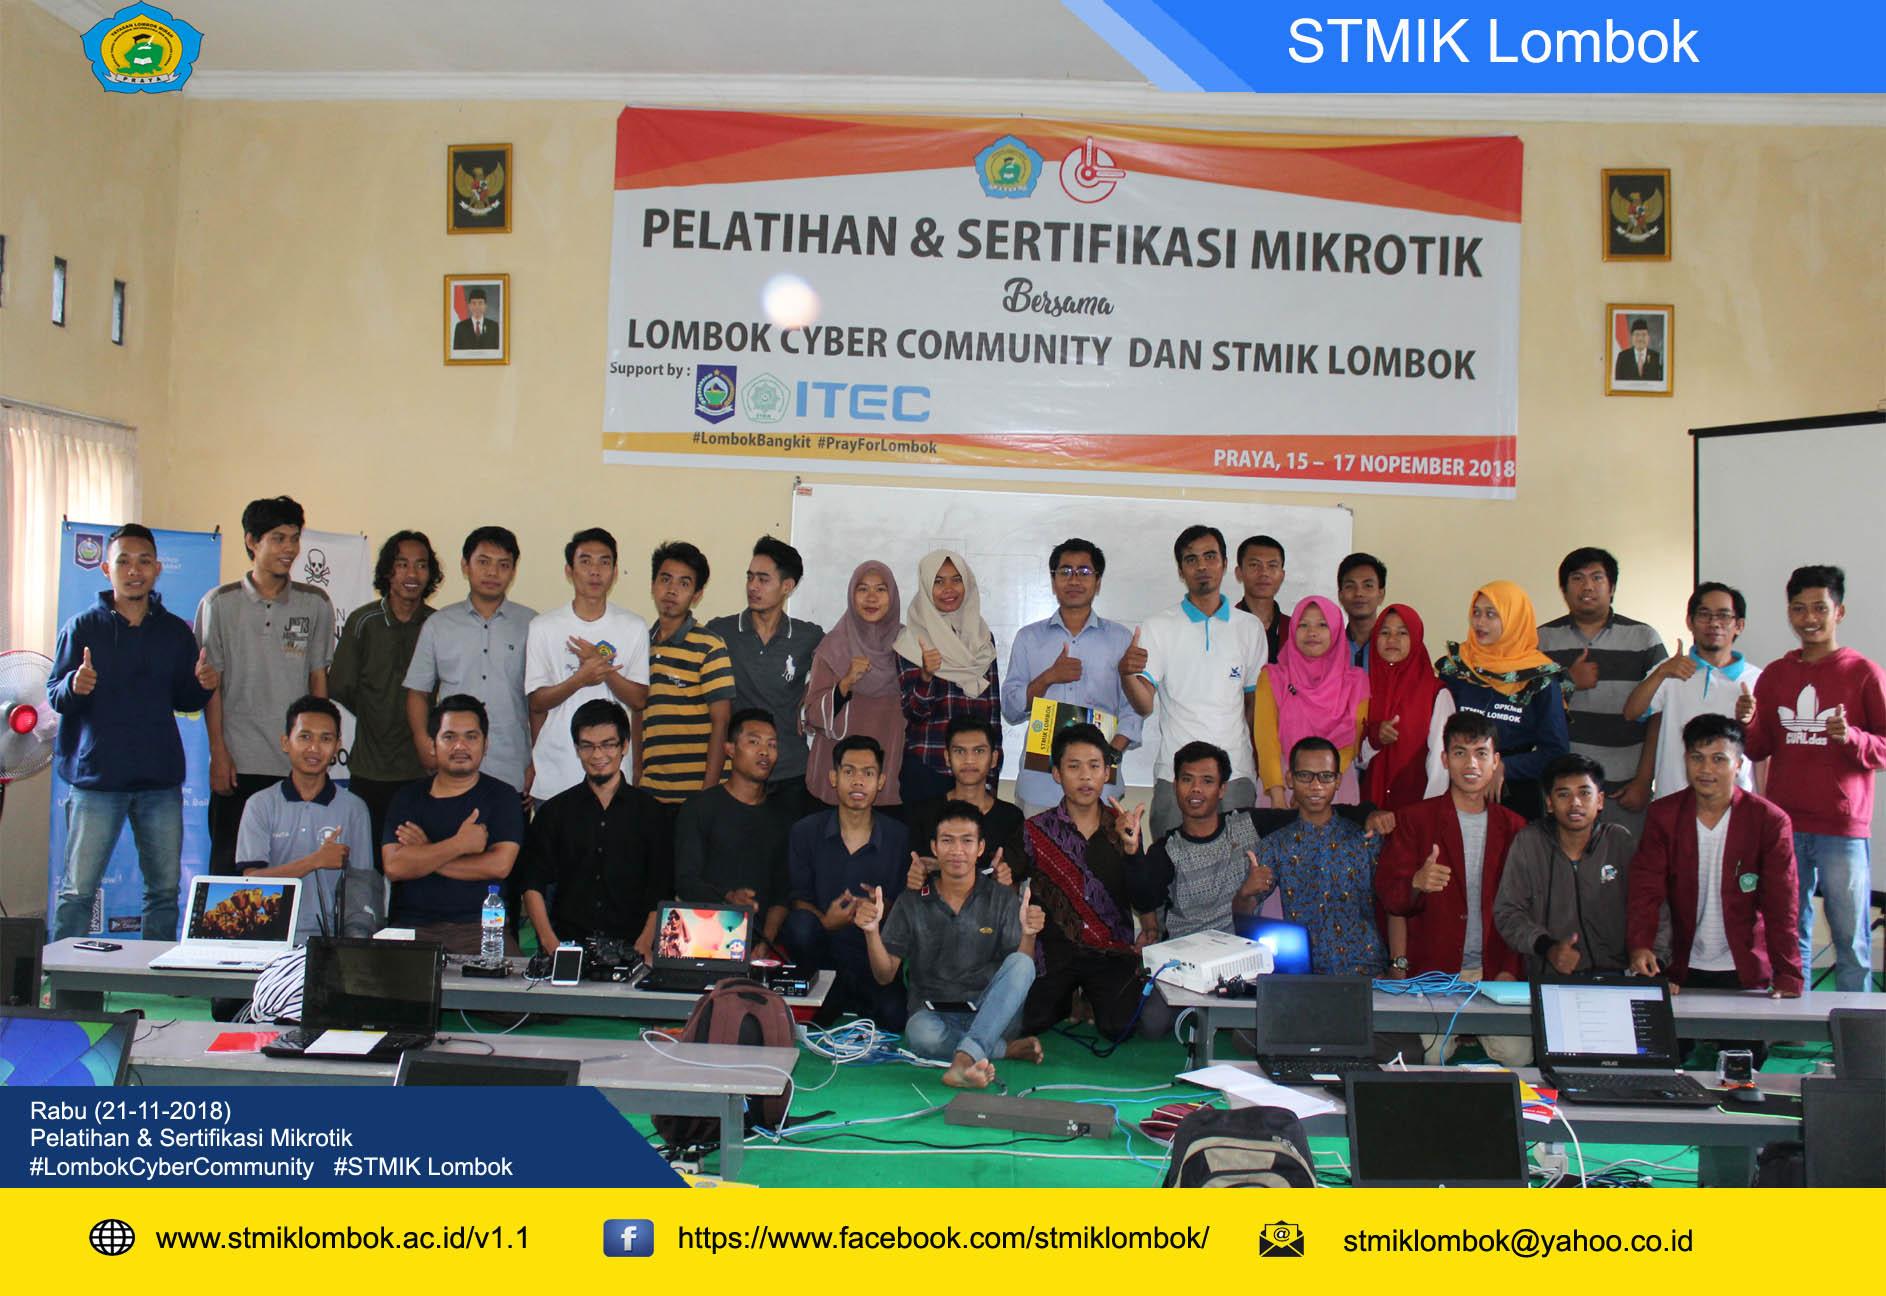 STMIK Lombok